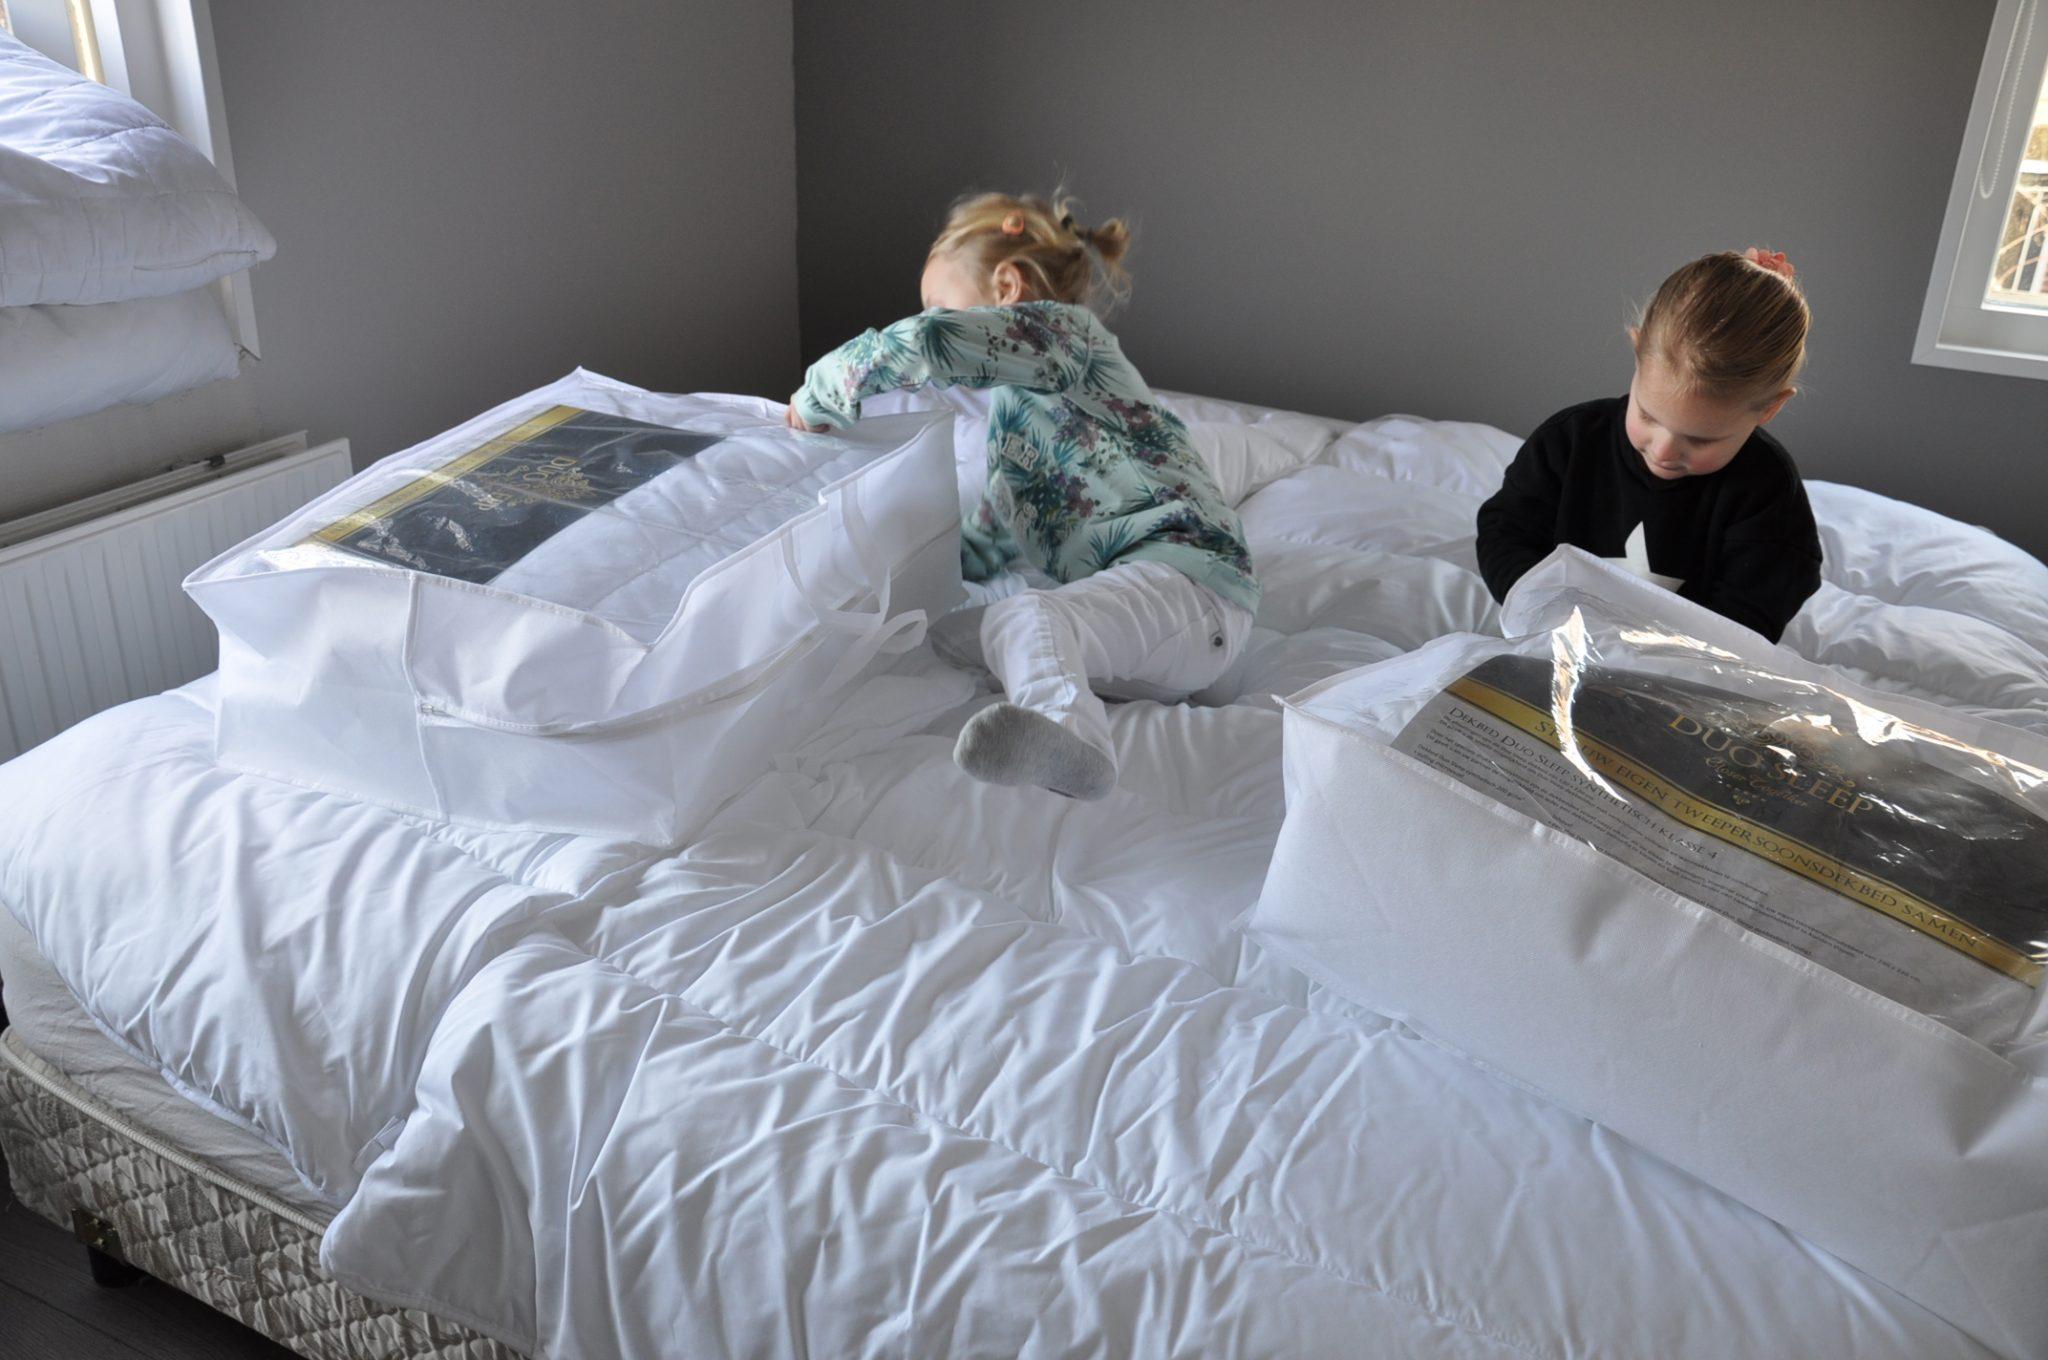 duo sleep beddengoed